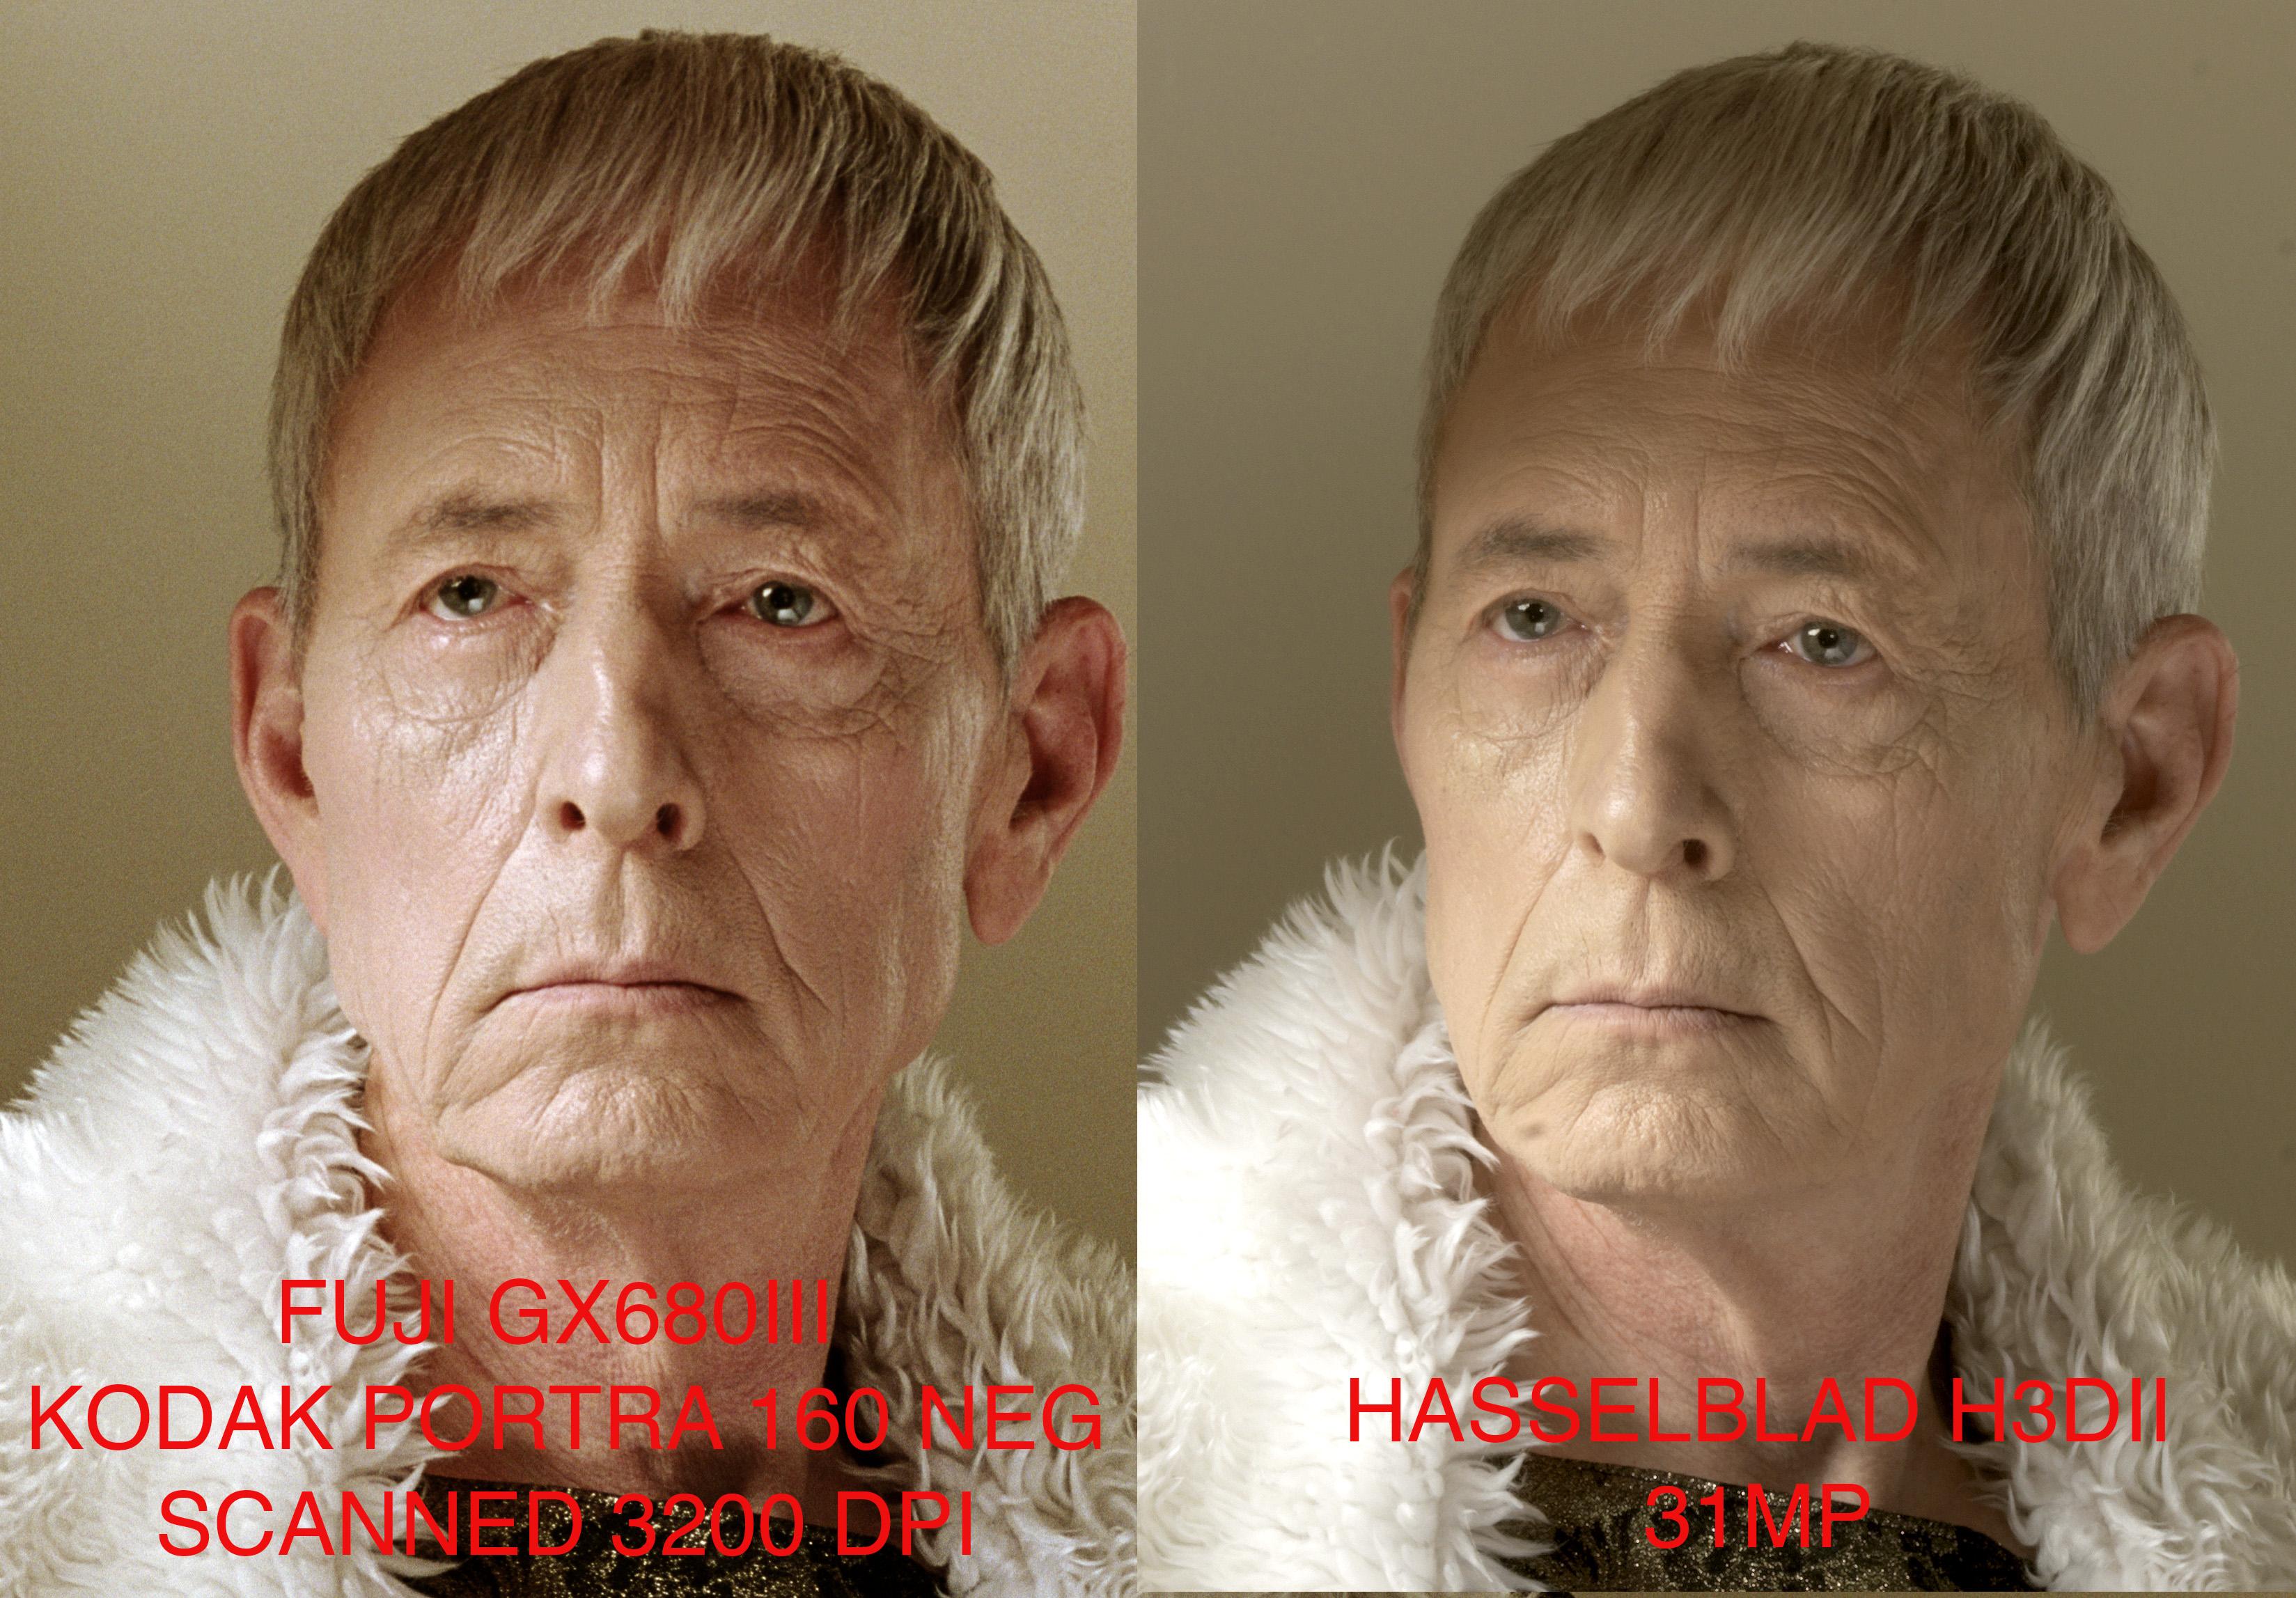 Film Vs. Digital comparison | clorstudios